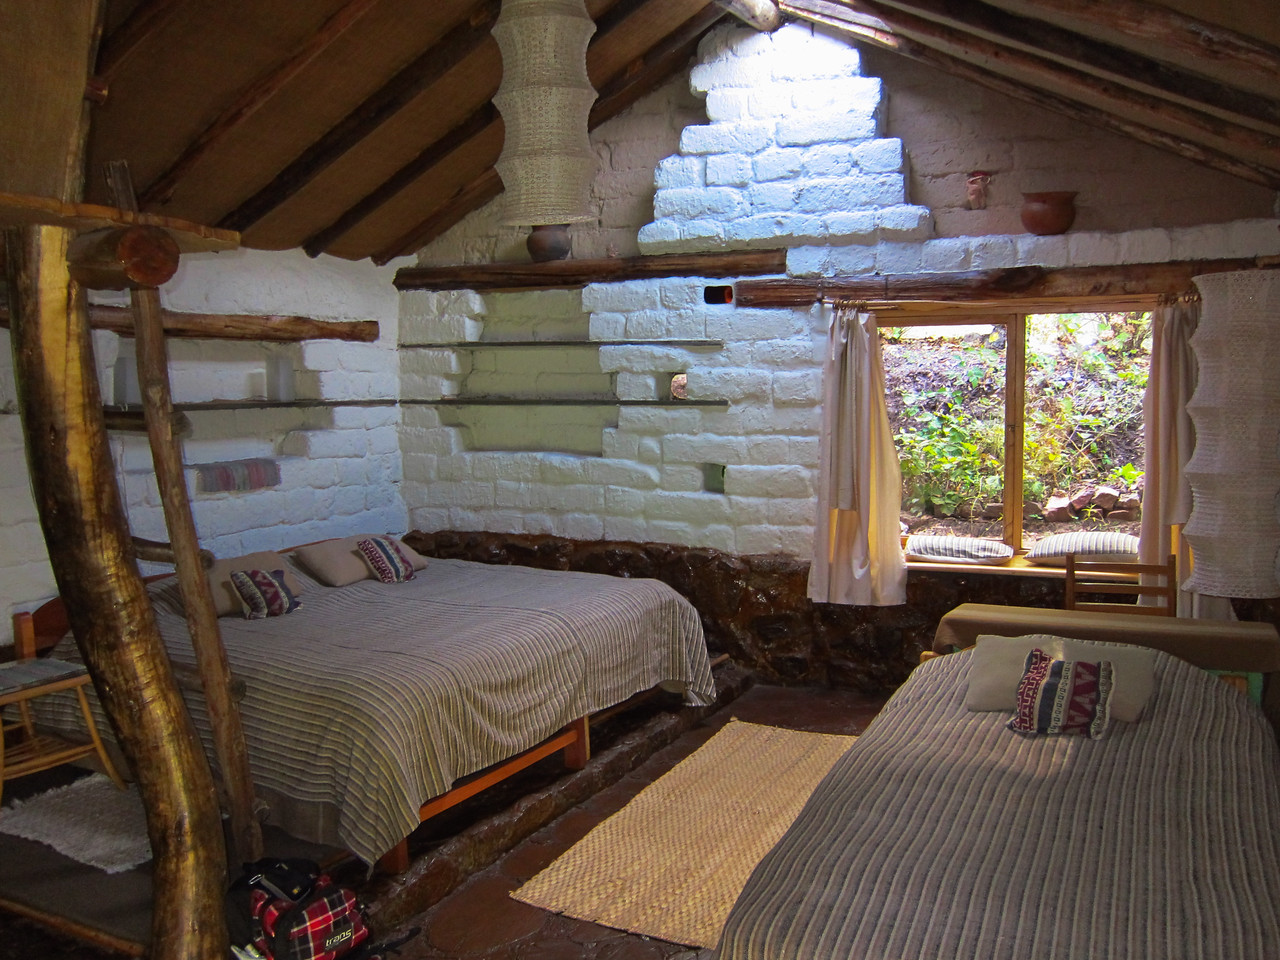 Hotel room at Las Chulpas Eco Lodge: http://www.chullpas.pe/